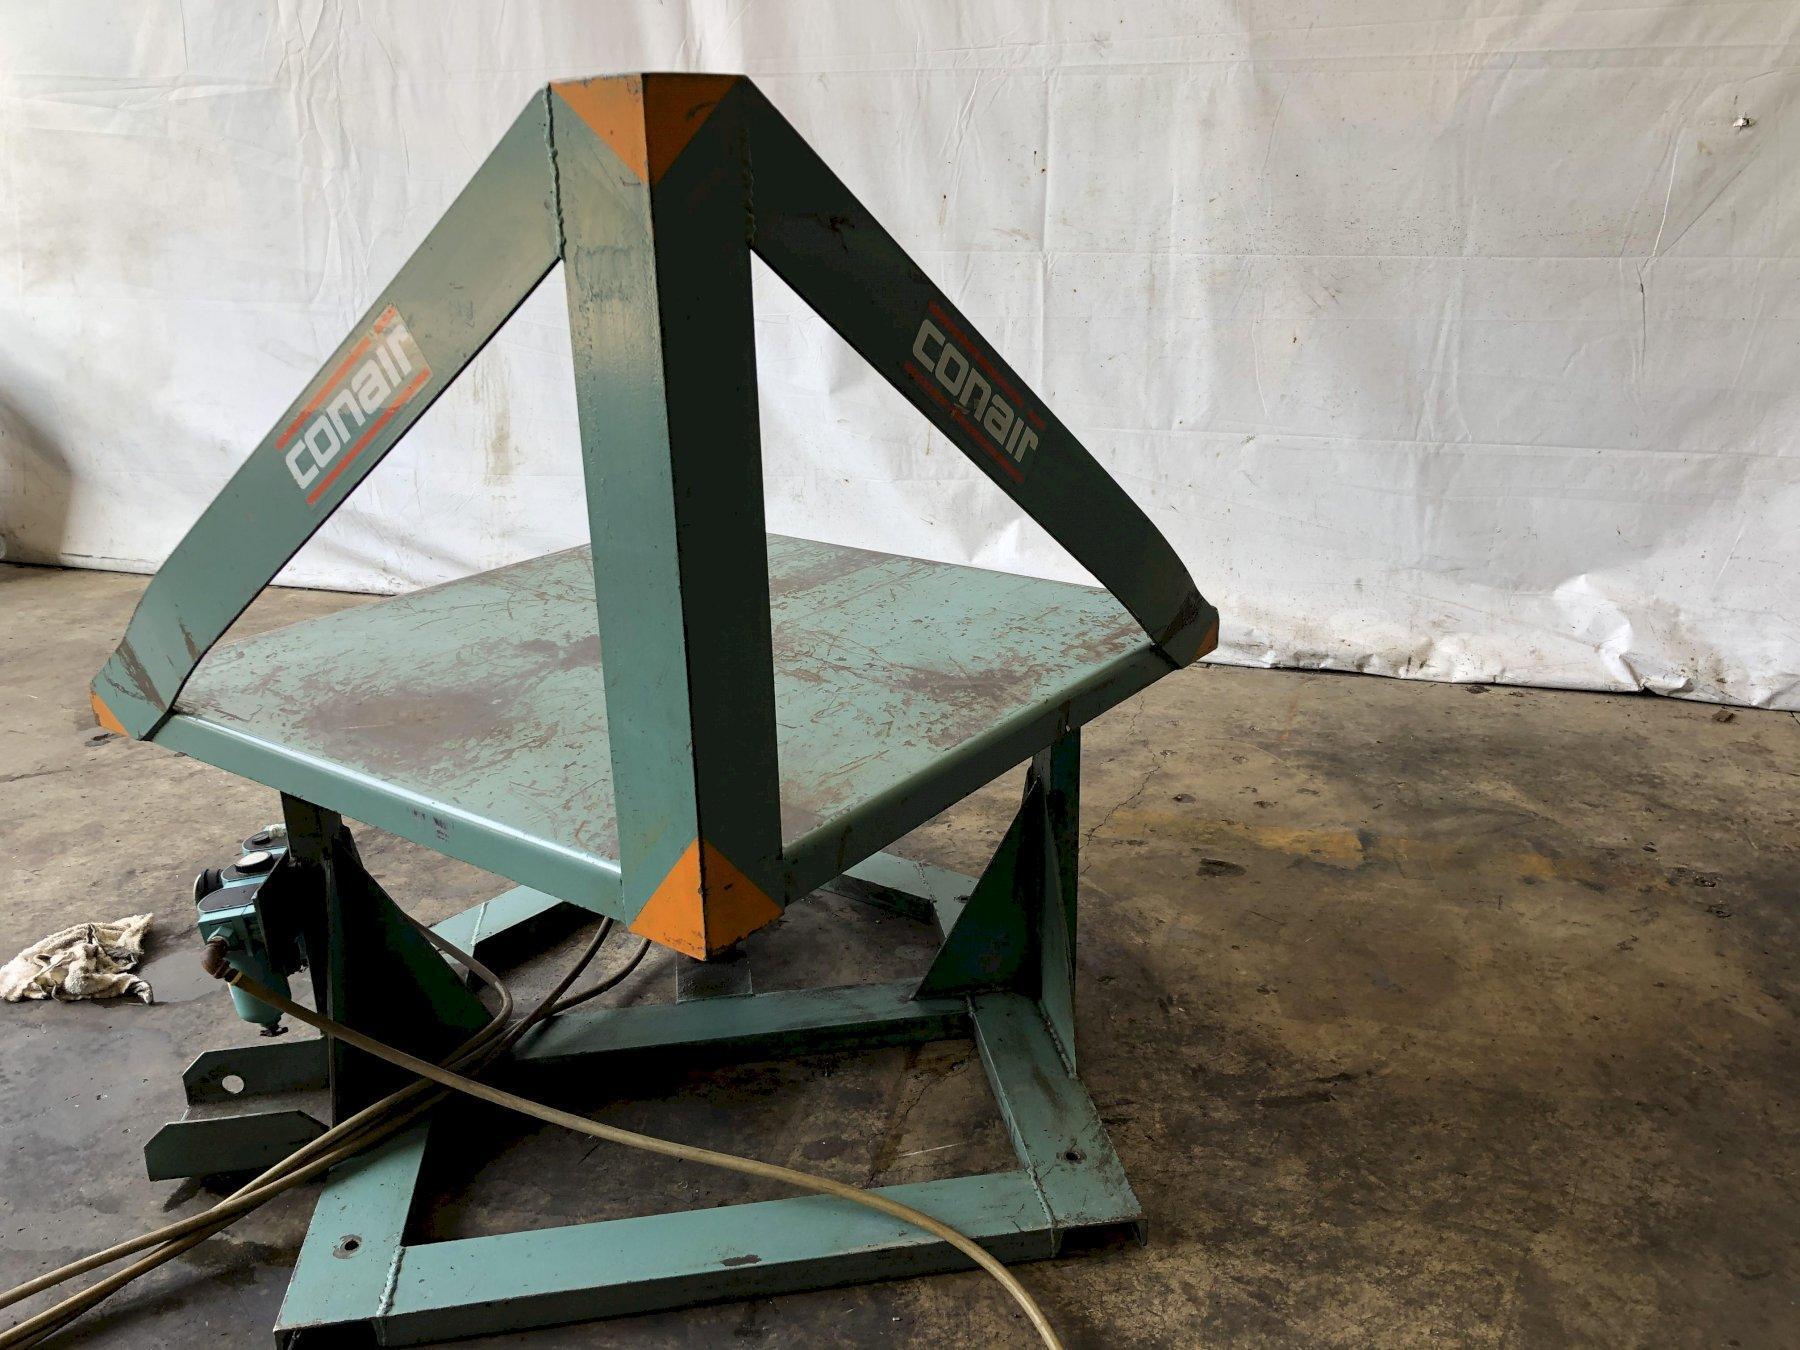 "40"" x 40"" CONAIR MODEL#120004 PNEUMATIC GAYLORD BOX TILTER UPENDER TIPPER: STOCK #13758"